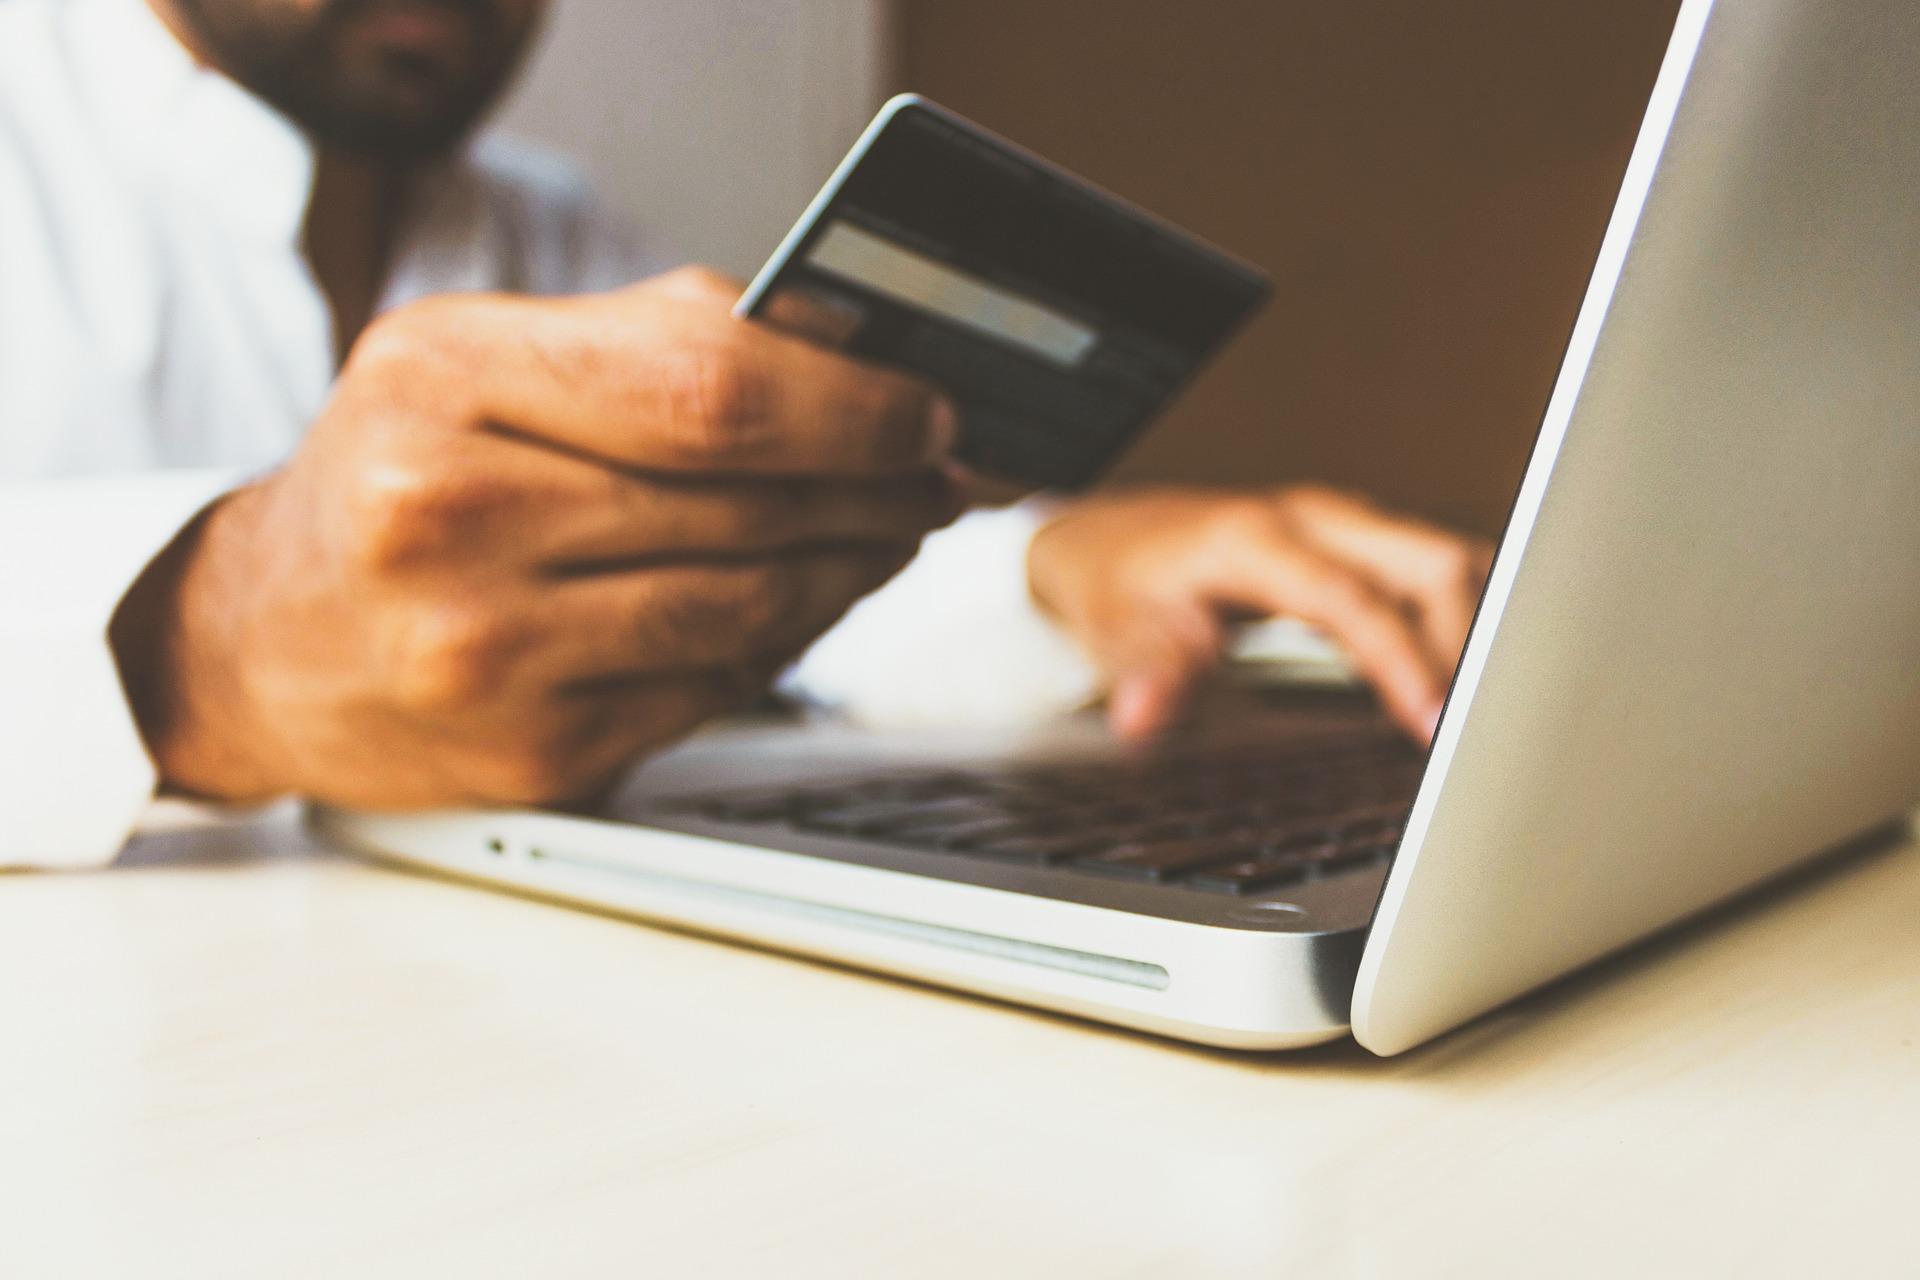 Novas regras de IVA nas compras online